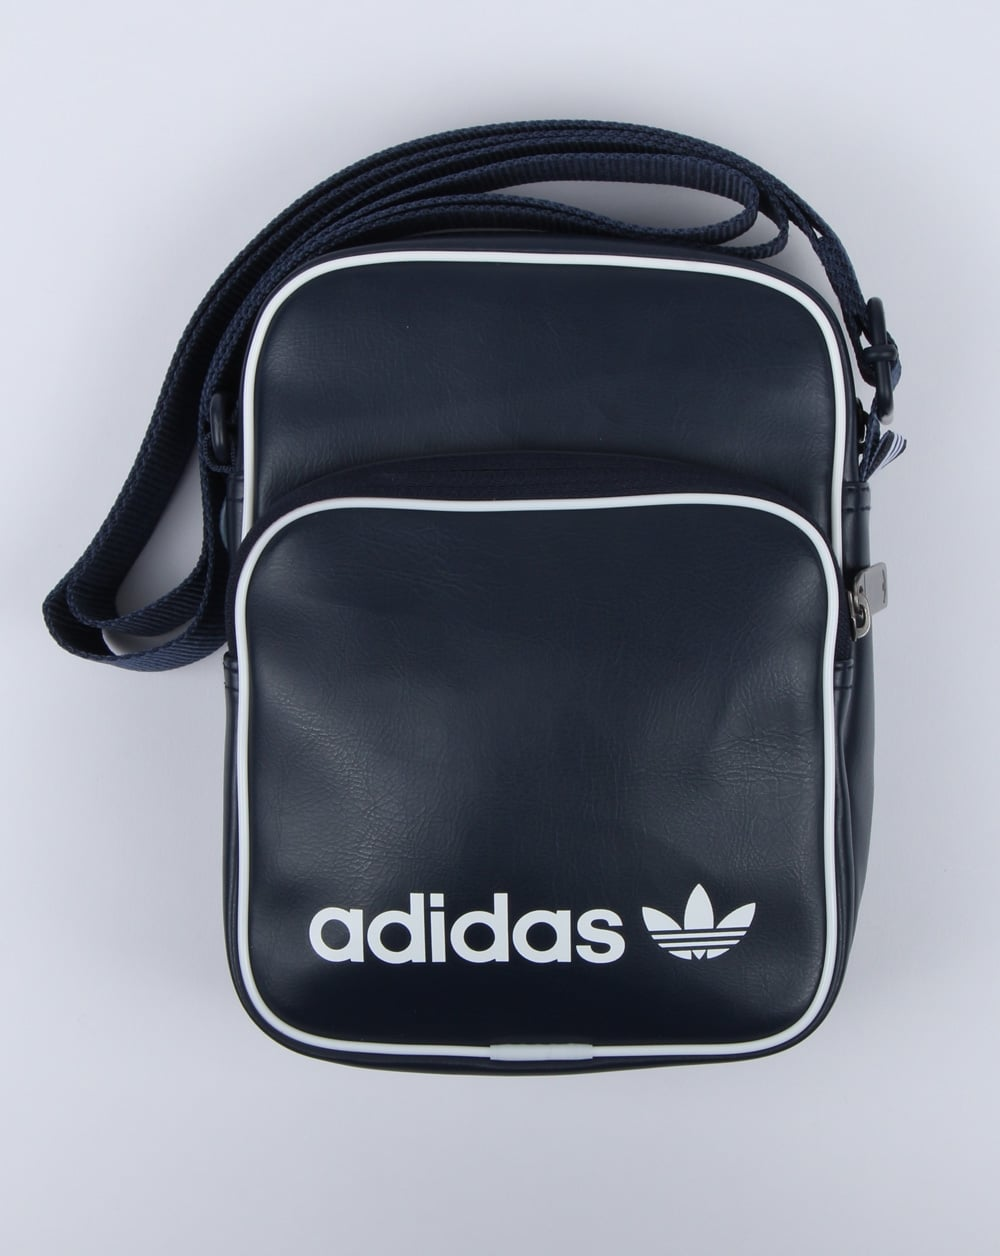 Adidas Originals Vintage Mini Bag Navy